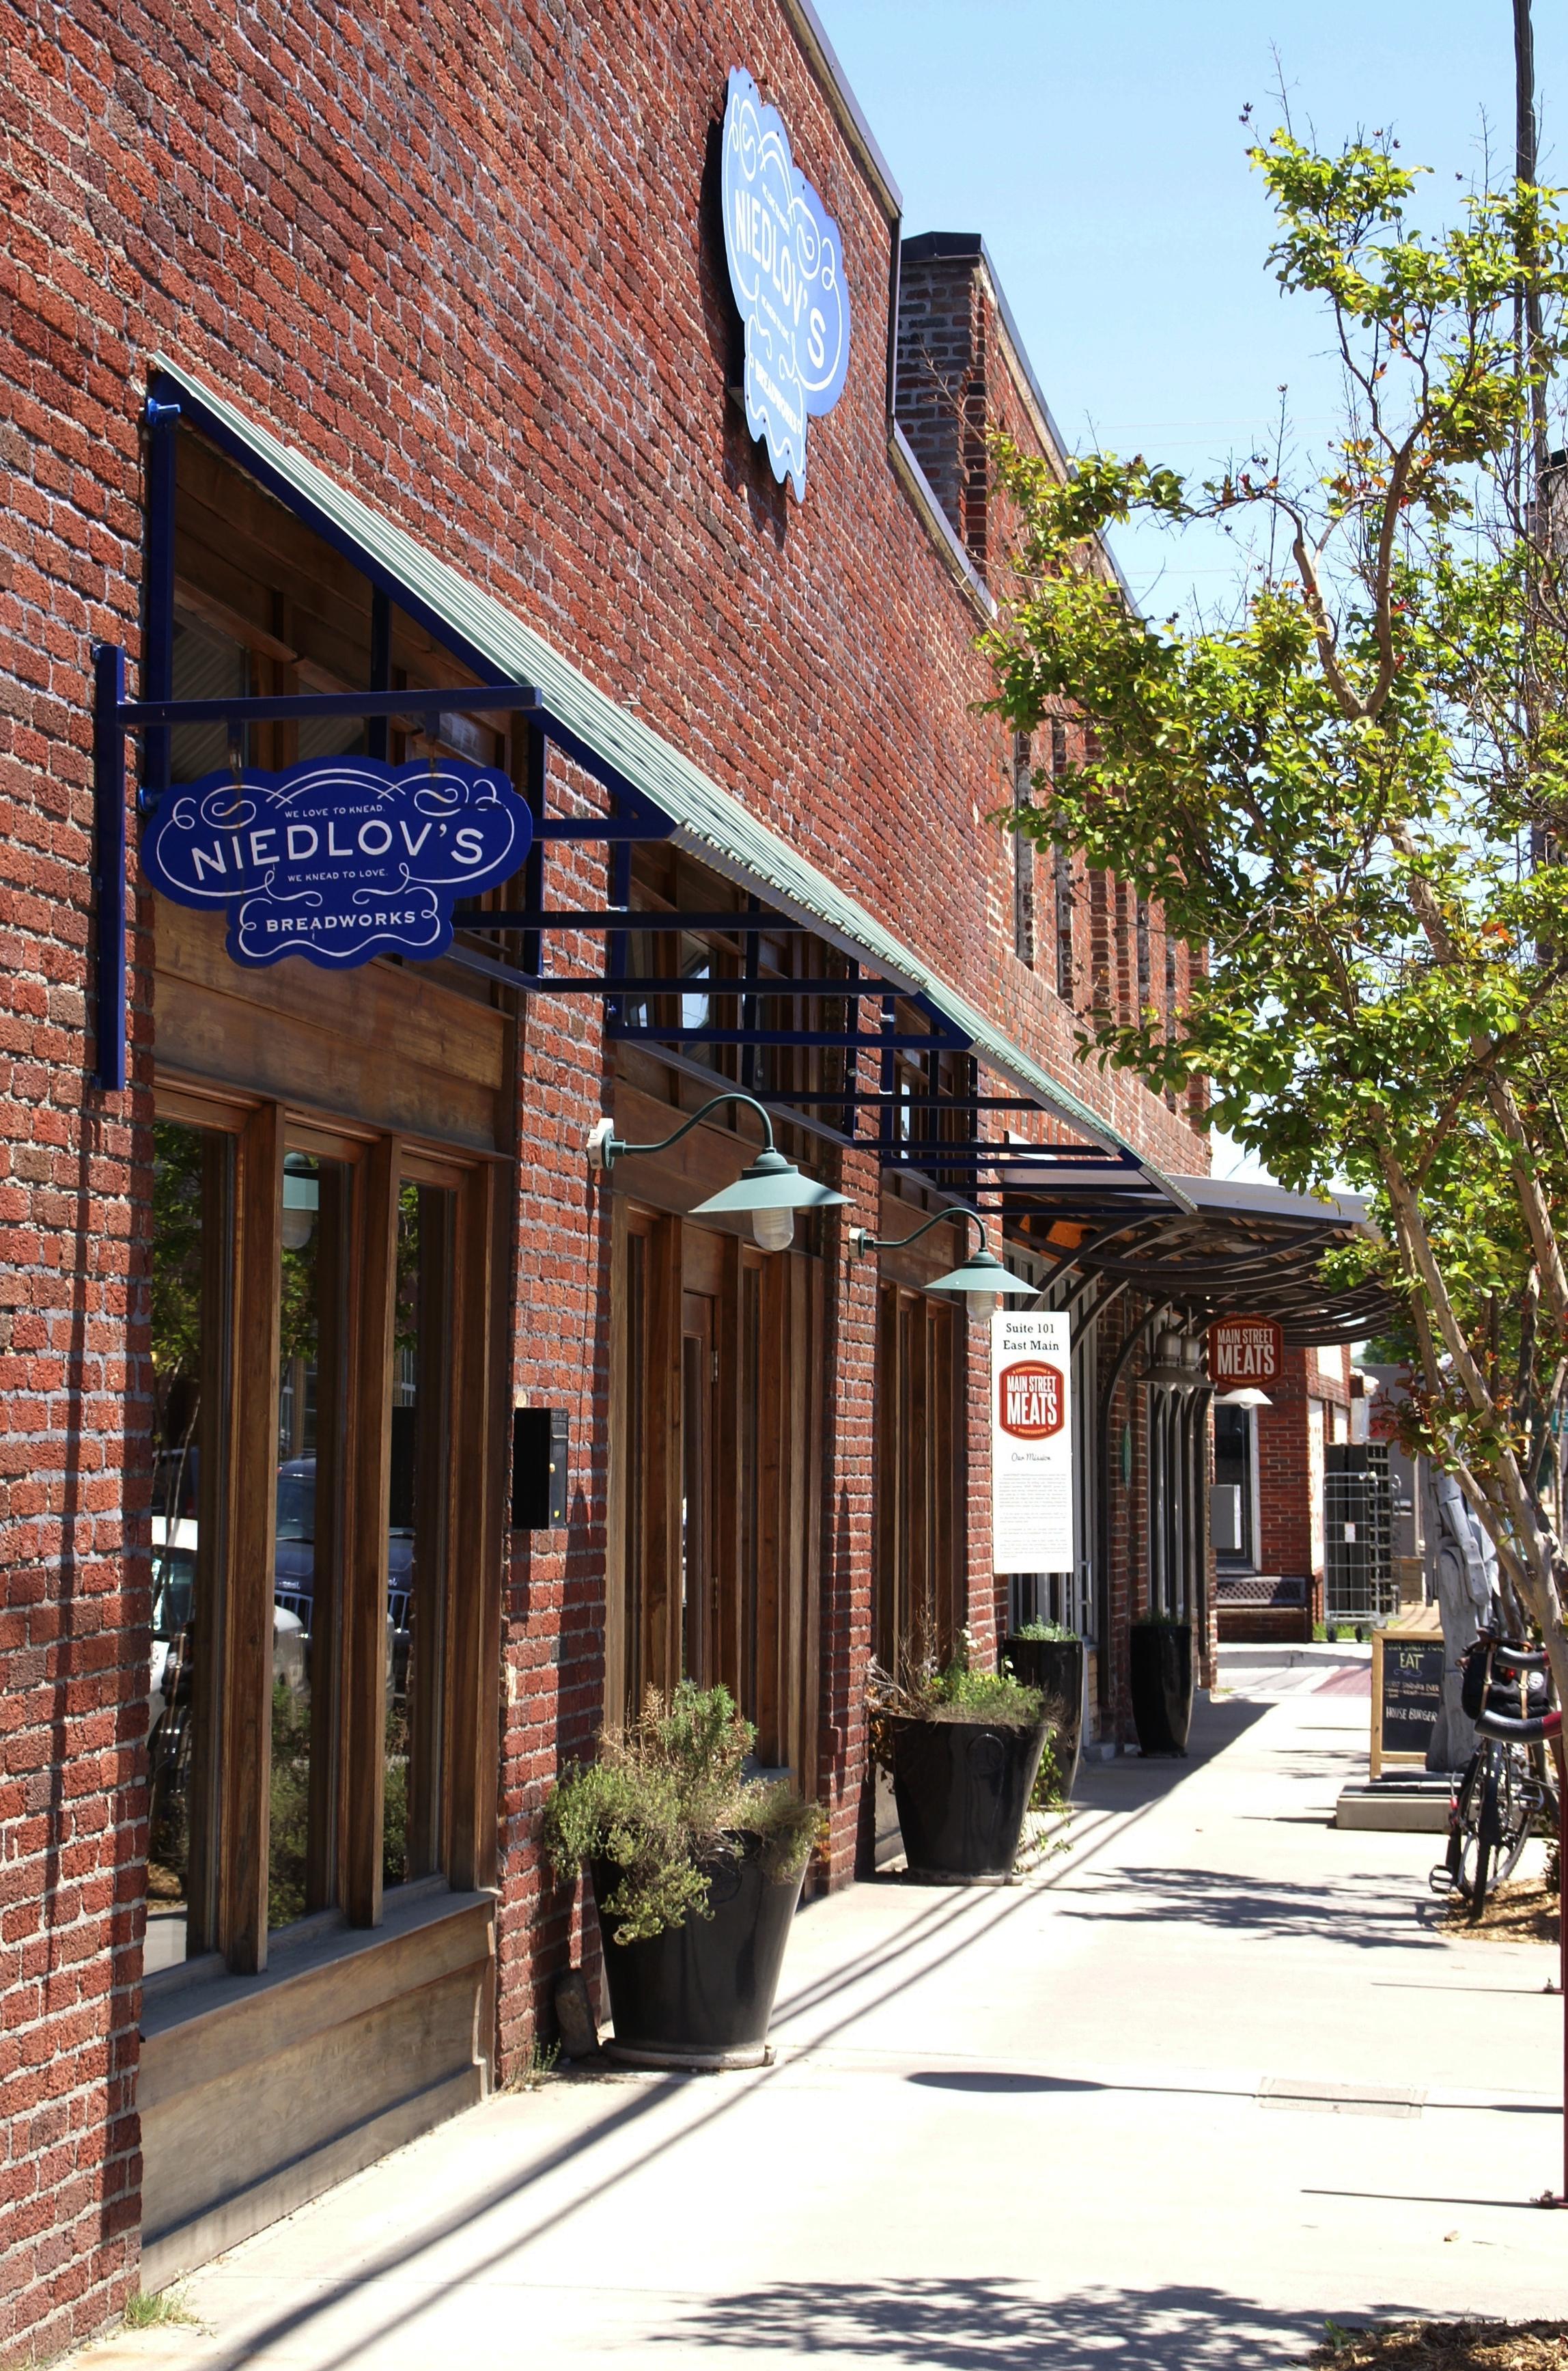 East Main Street revitalization in Chattanooga TN